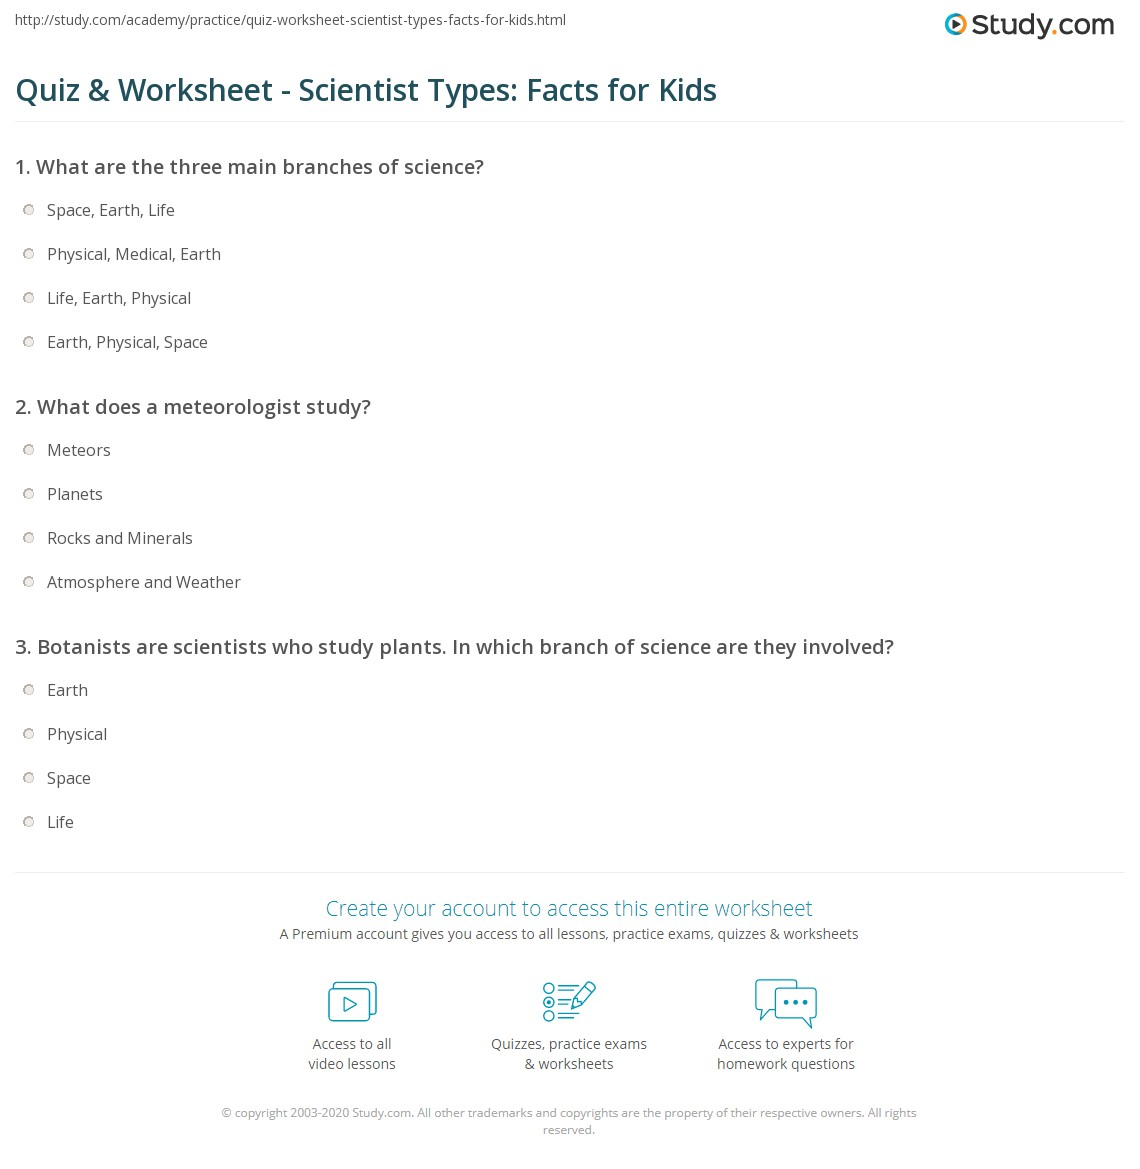 Quiz & Worksheet - Scientist Types: Facts for Kids | Study.com